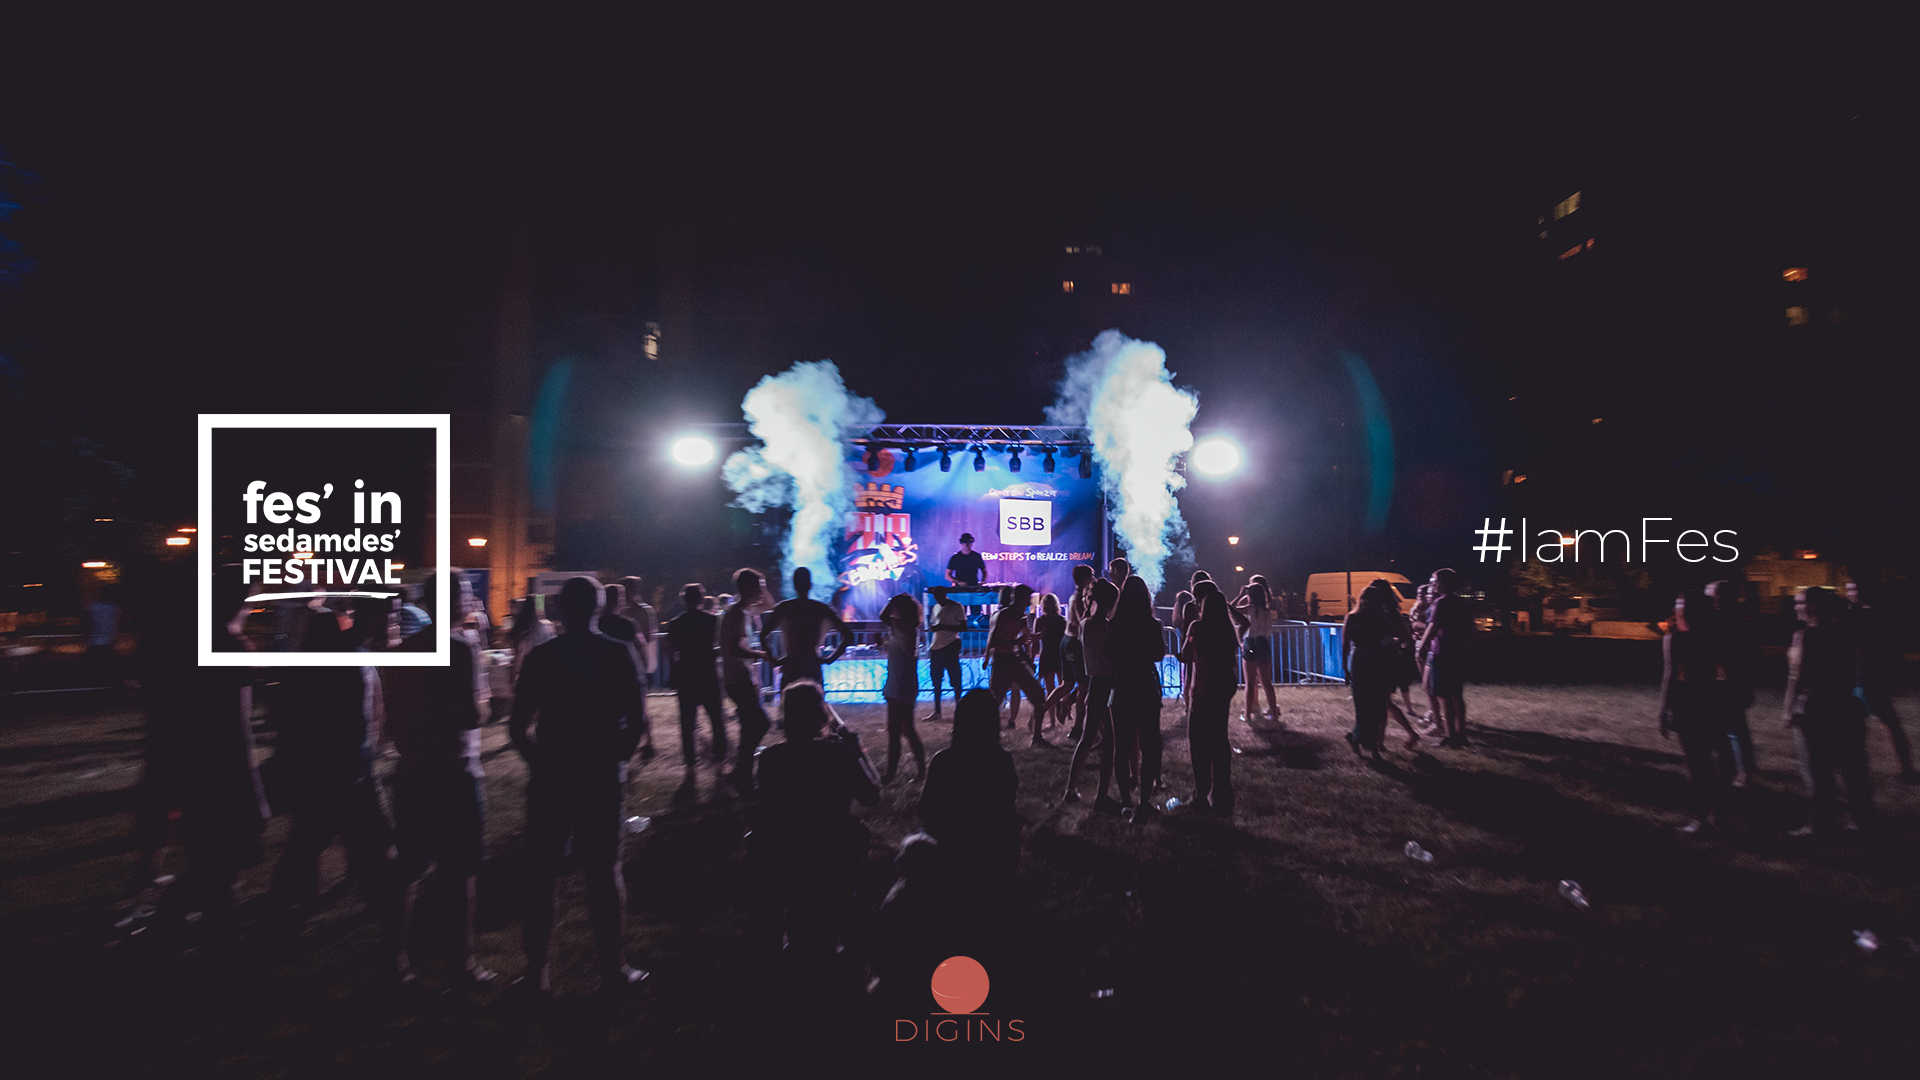 Fes' in Sedamdes': Posetite humanitarni festival u Beogradu